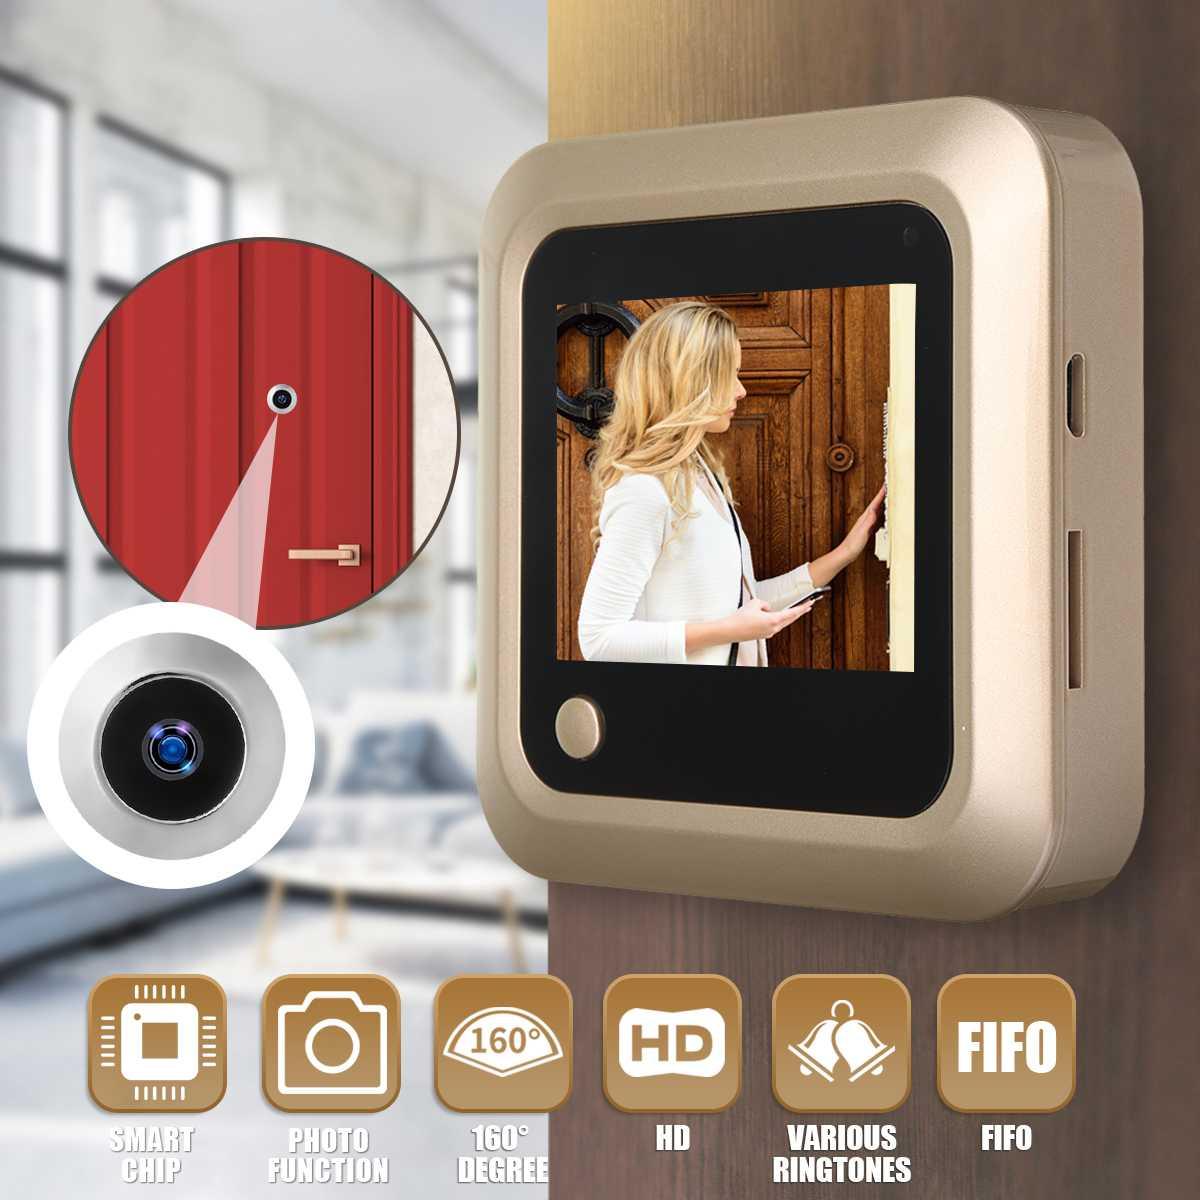 Hot Sale 2.4 inch Digital LCD Video Doorbell Peephole Viewer Door Eye Monitoring Camera With LCD TFT 160 Degree Doorbell